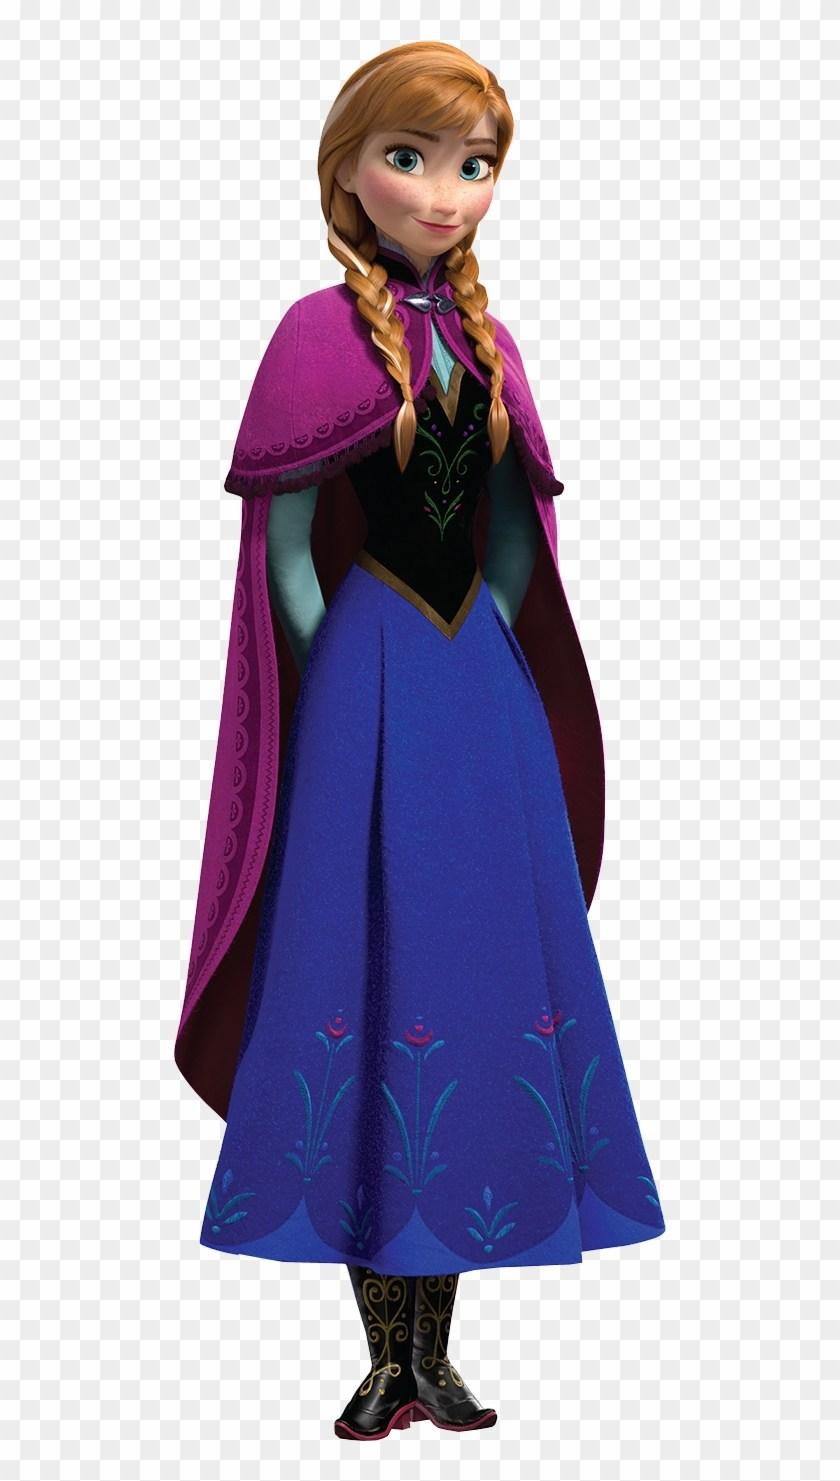 Frozen characters clipart 3 » Clipart Portal.